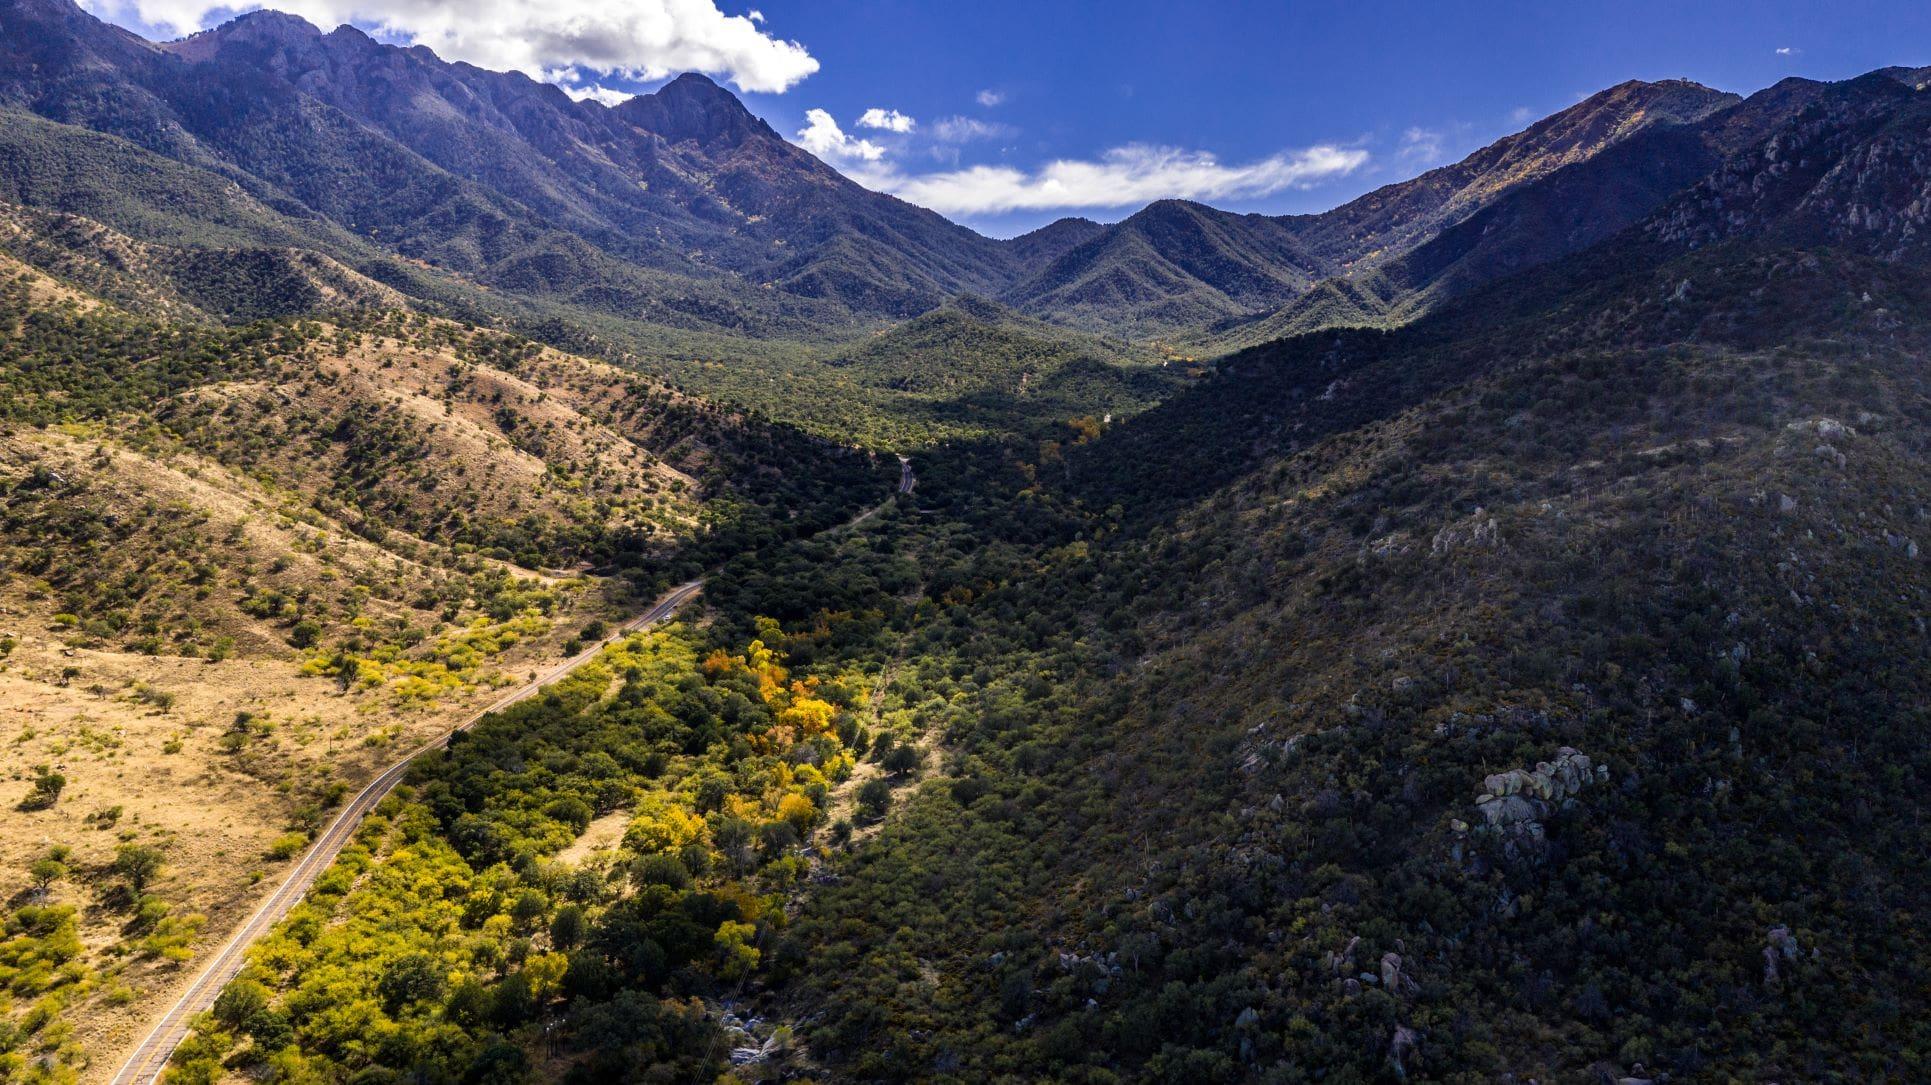 Madera Canyon Arizona